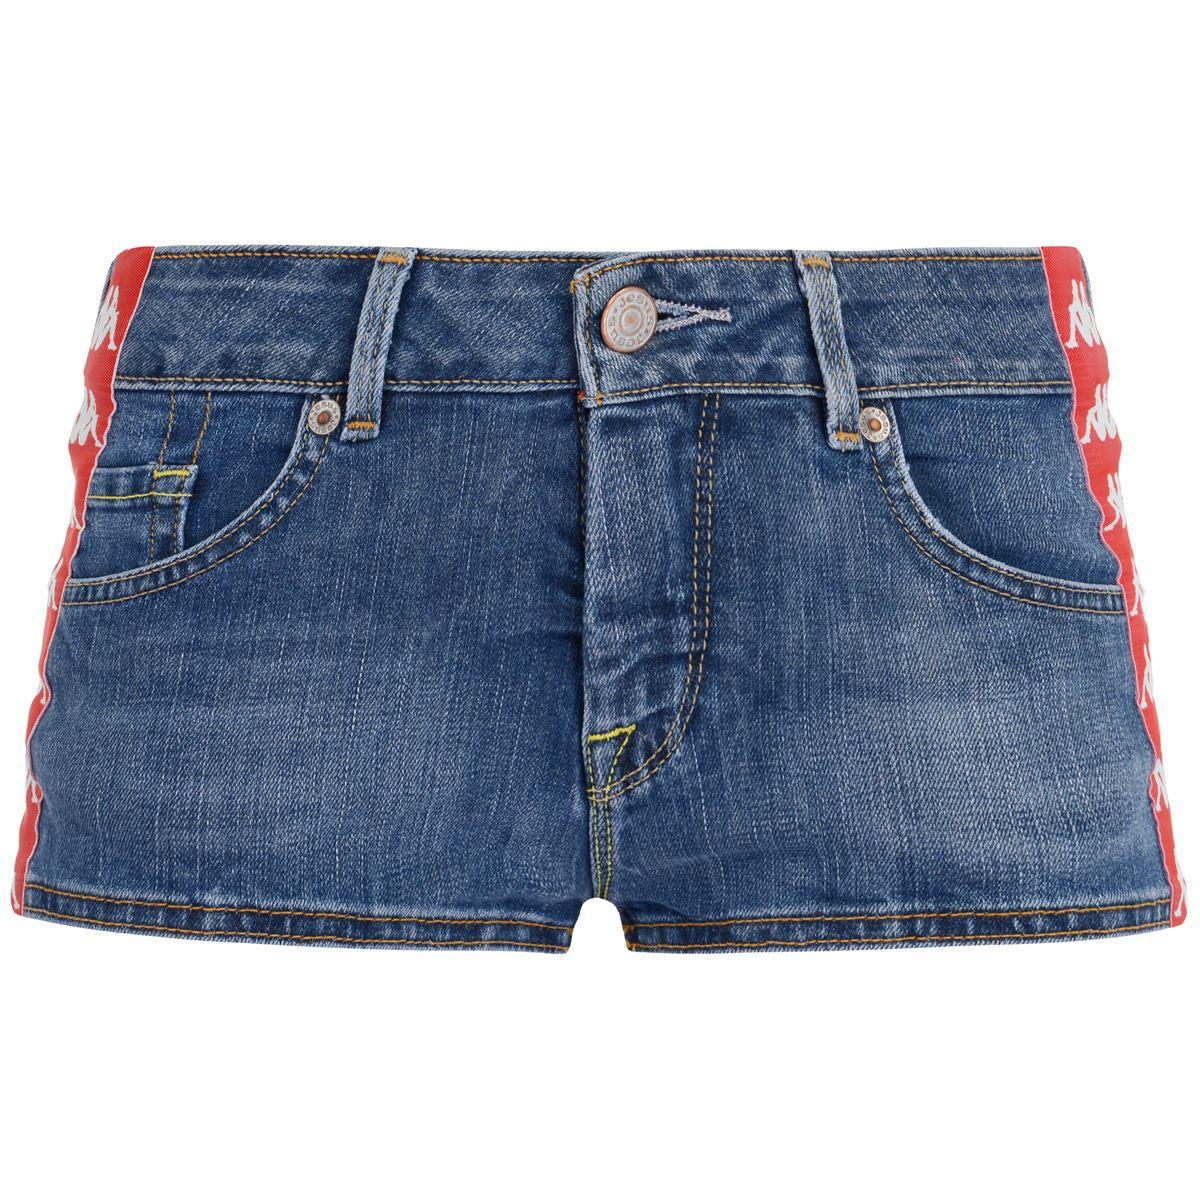 Jesus Jeans Pantaloncini donna-461196WKPA